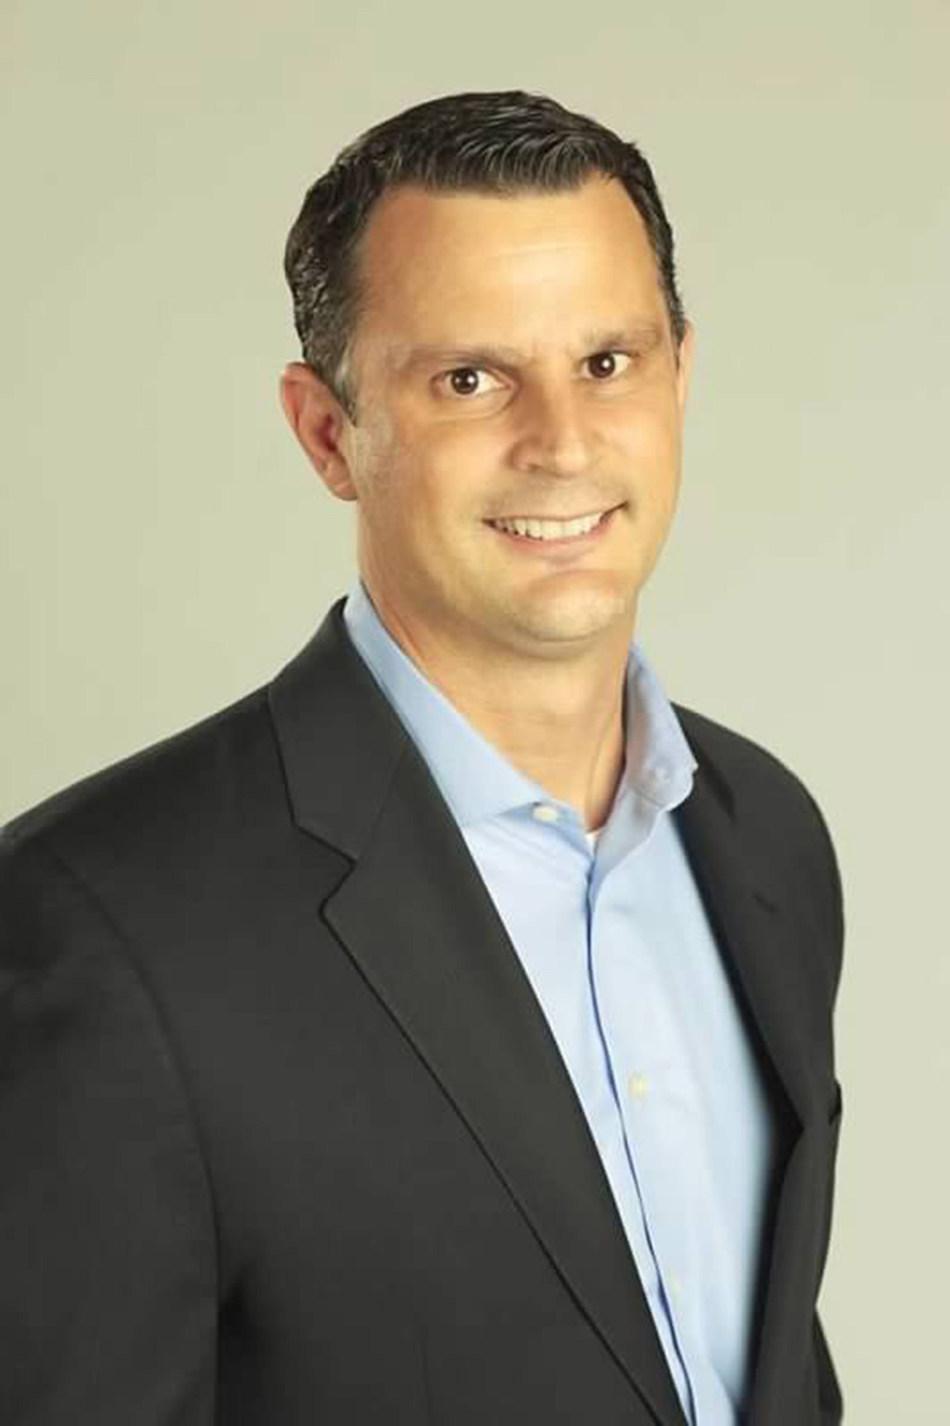 Daniel Clark joins Logile as senior vice president of global sales.